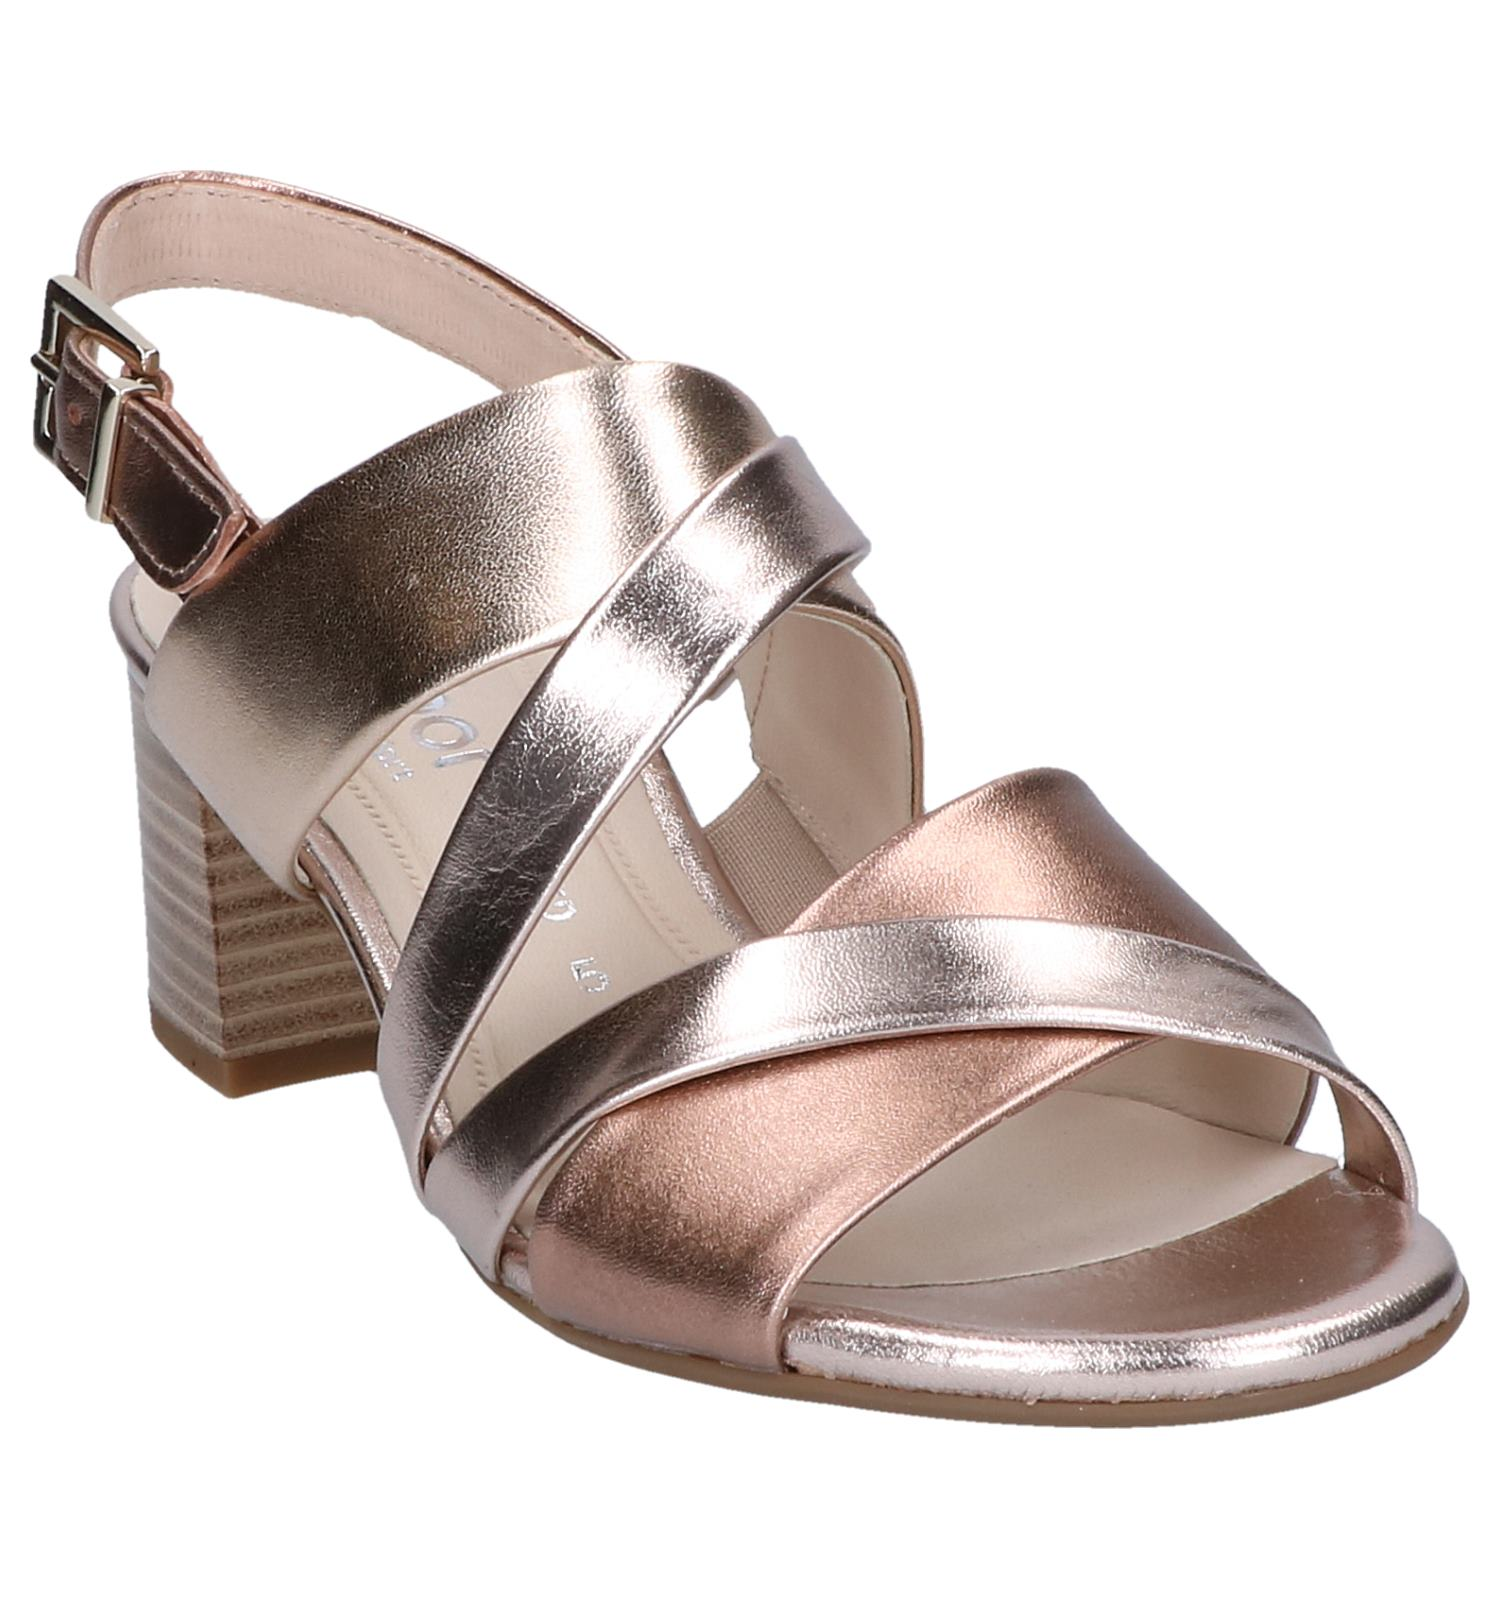 Gouden Gouden Gabor Sandalen Sandalen Comfort sCQdrthx